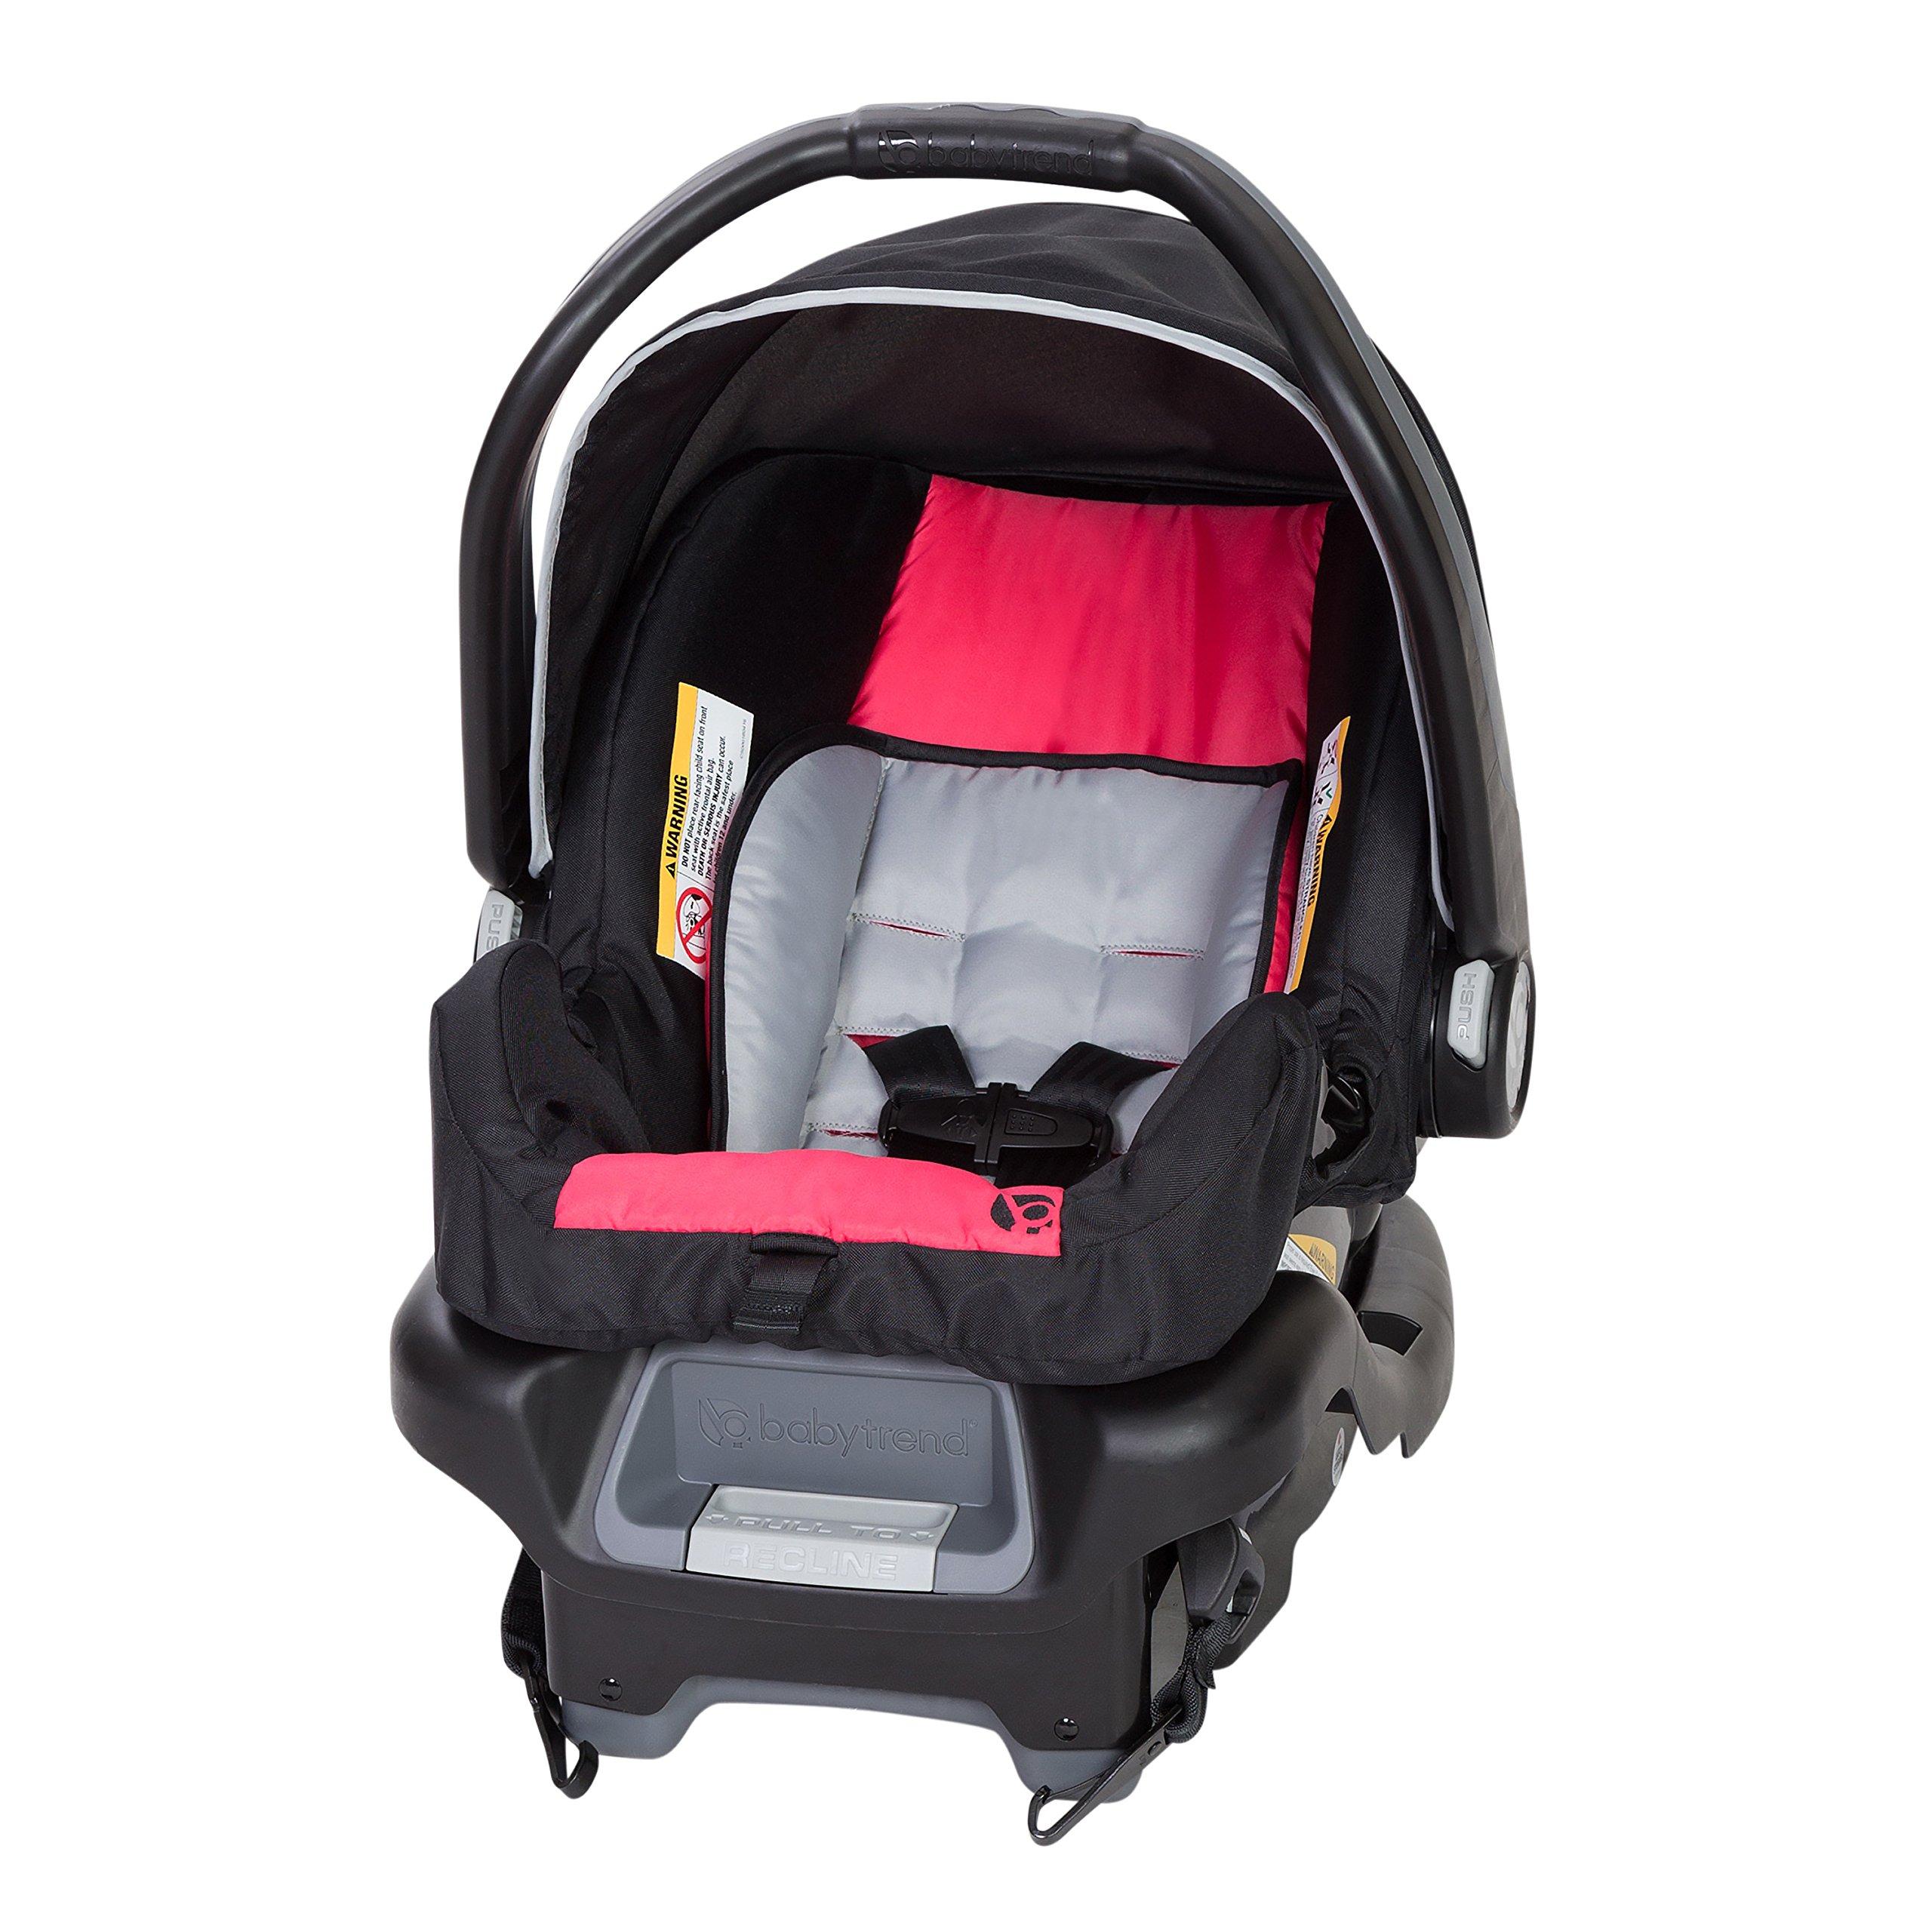 Amazon.com : Baby Trend Sit N Stand Ultra Tandem Stroller, Phantom on